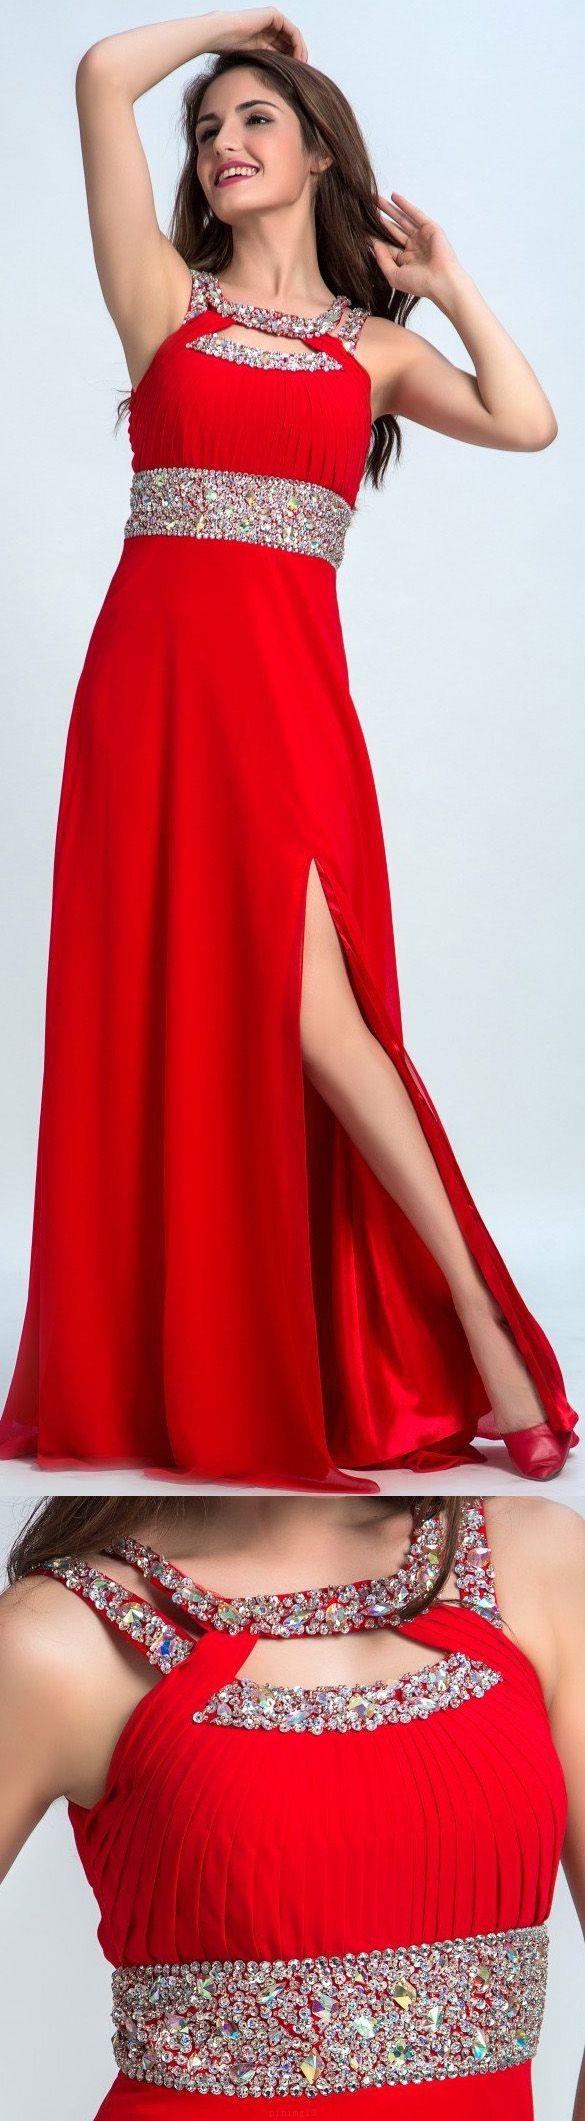 Red prom dresses long prom dresses open back prom dresses long